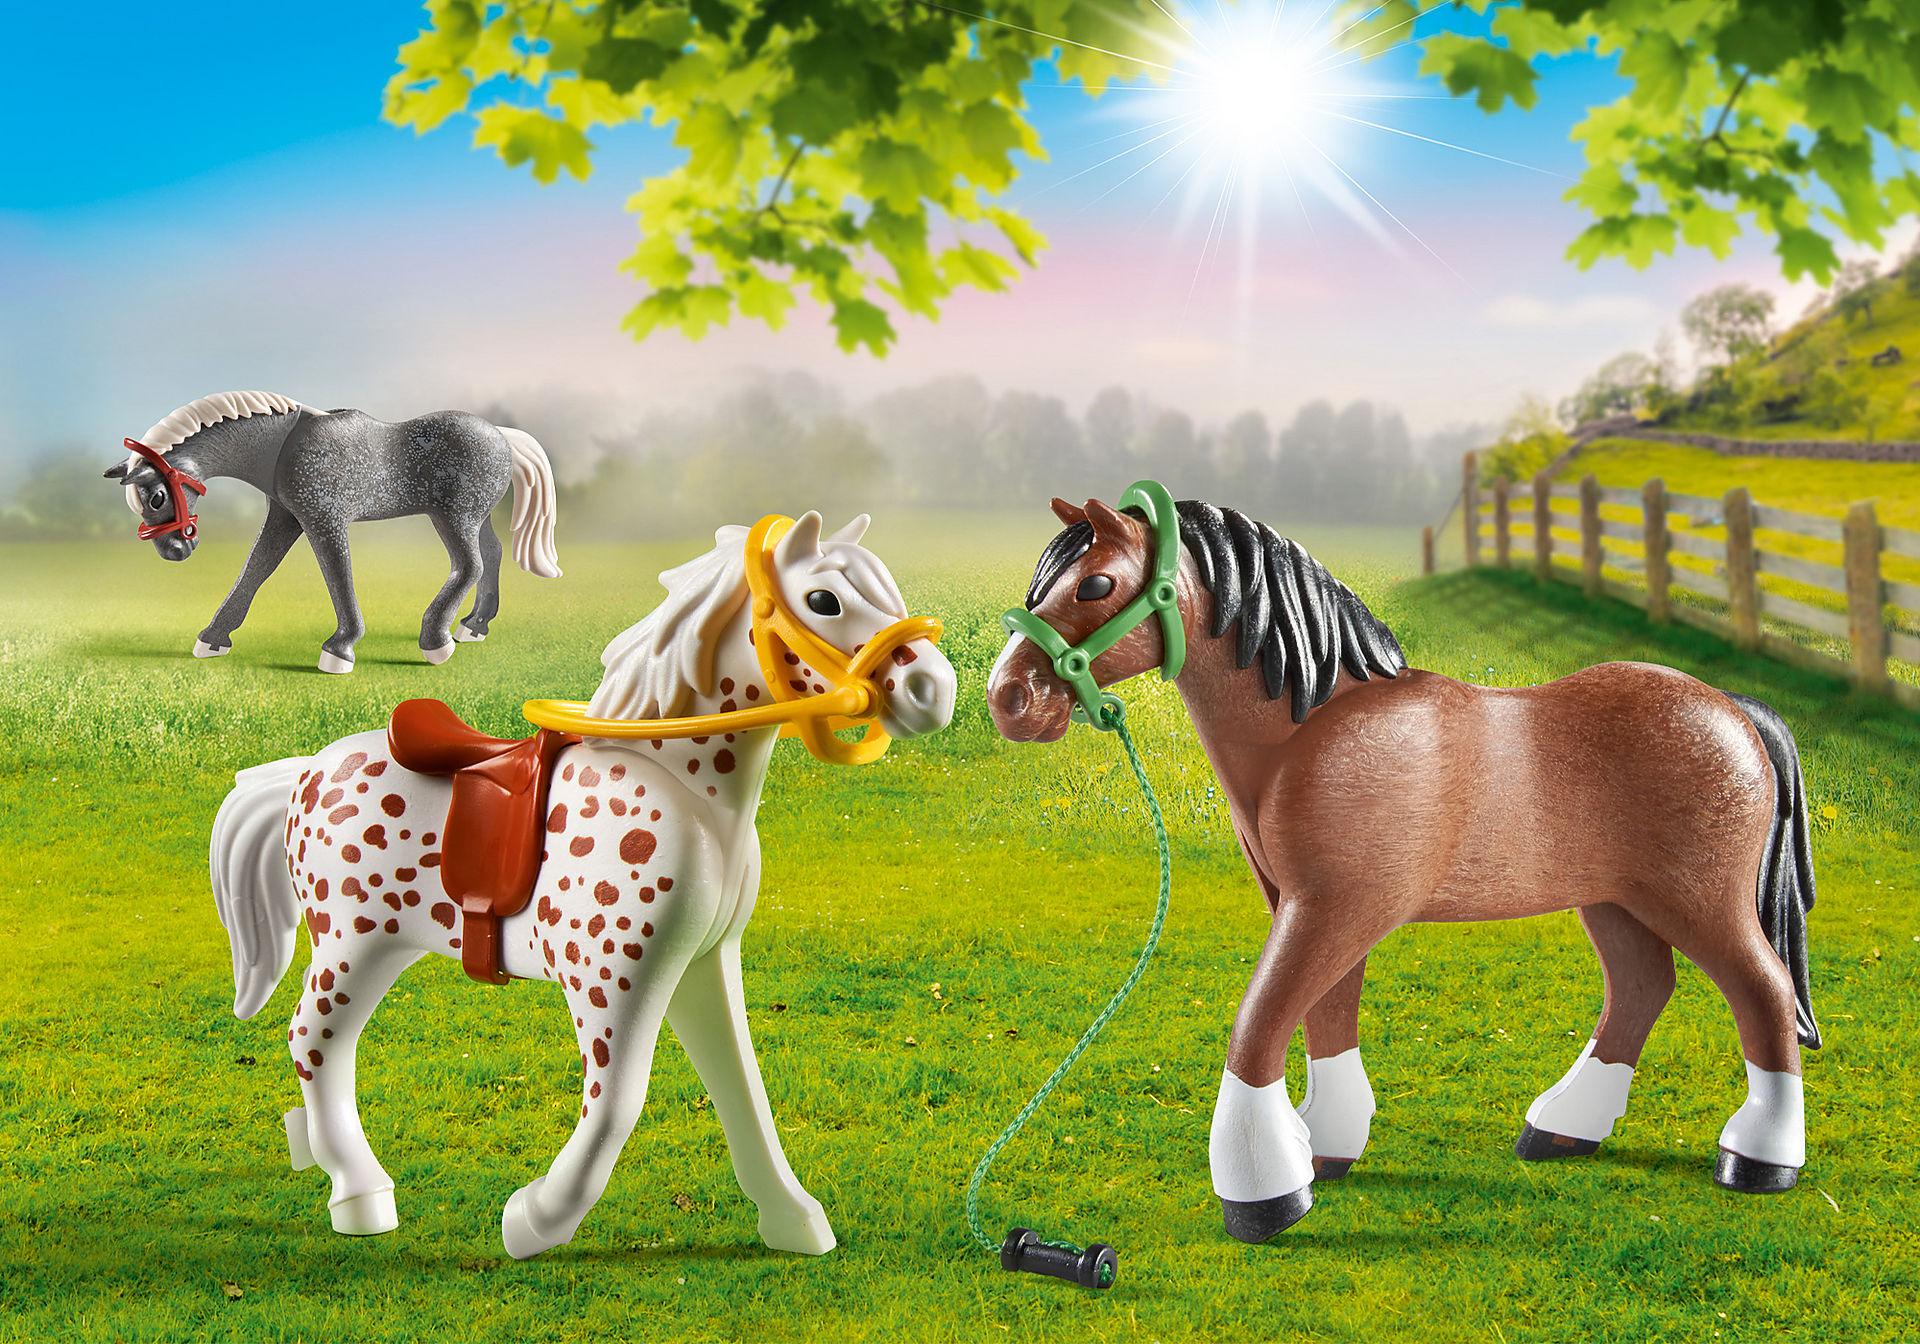 70683 3 Pferde zoom image1